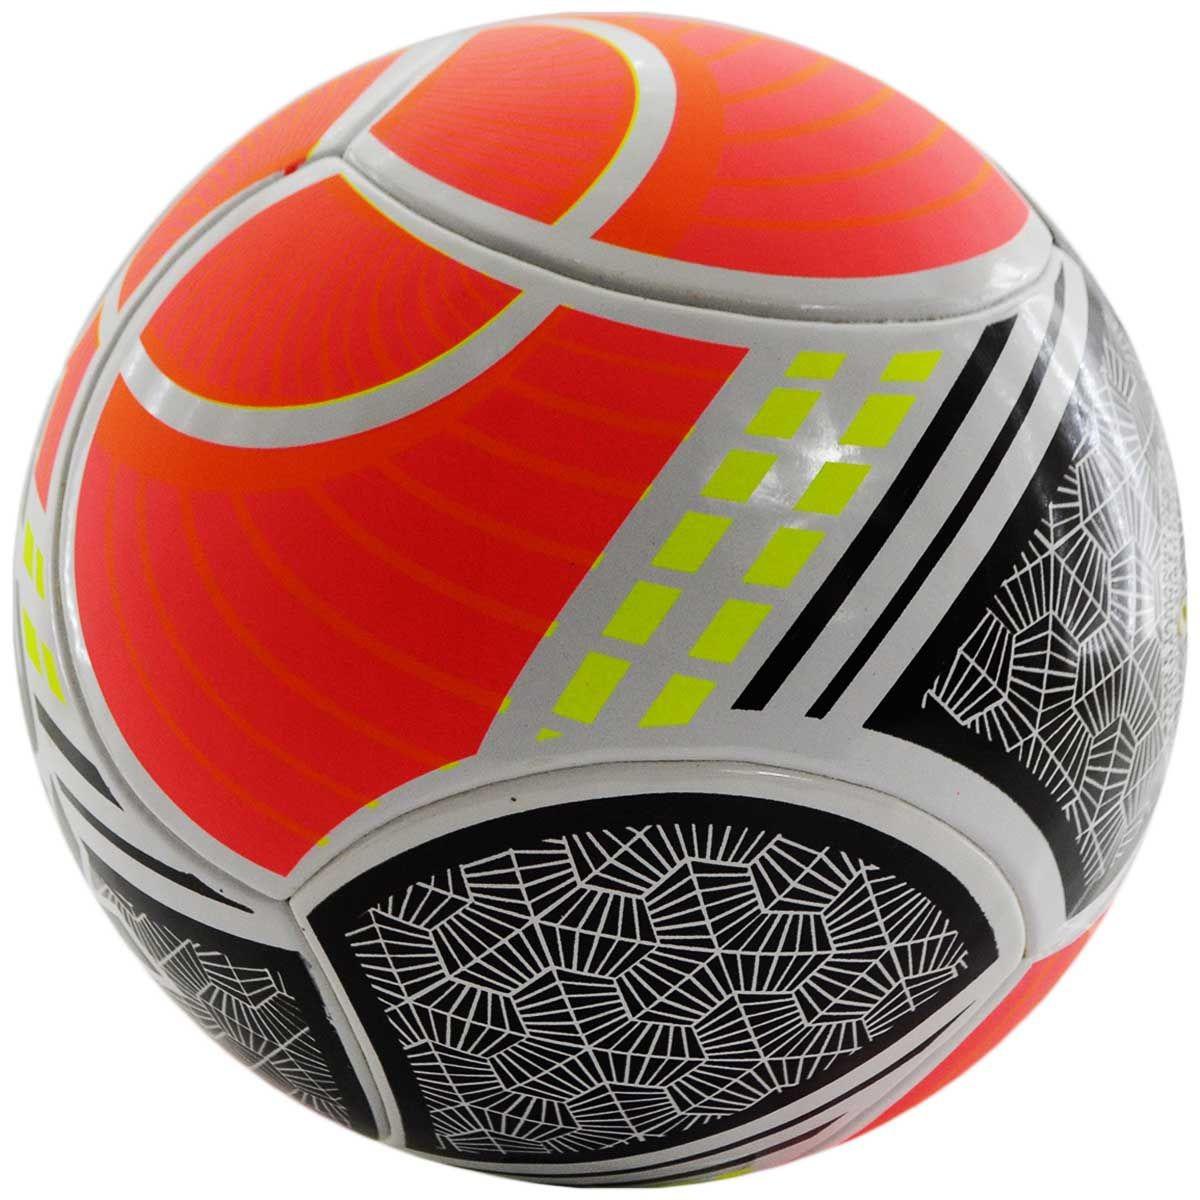 5fd3ee429e bola dray termofusion futsal oficial original impermeável+nf. Carregando  zoom.